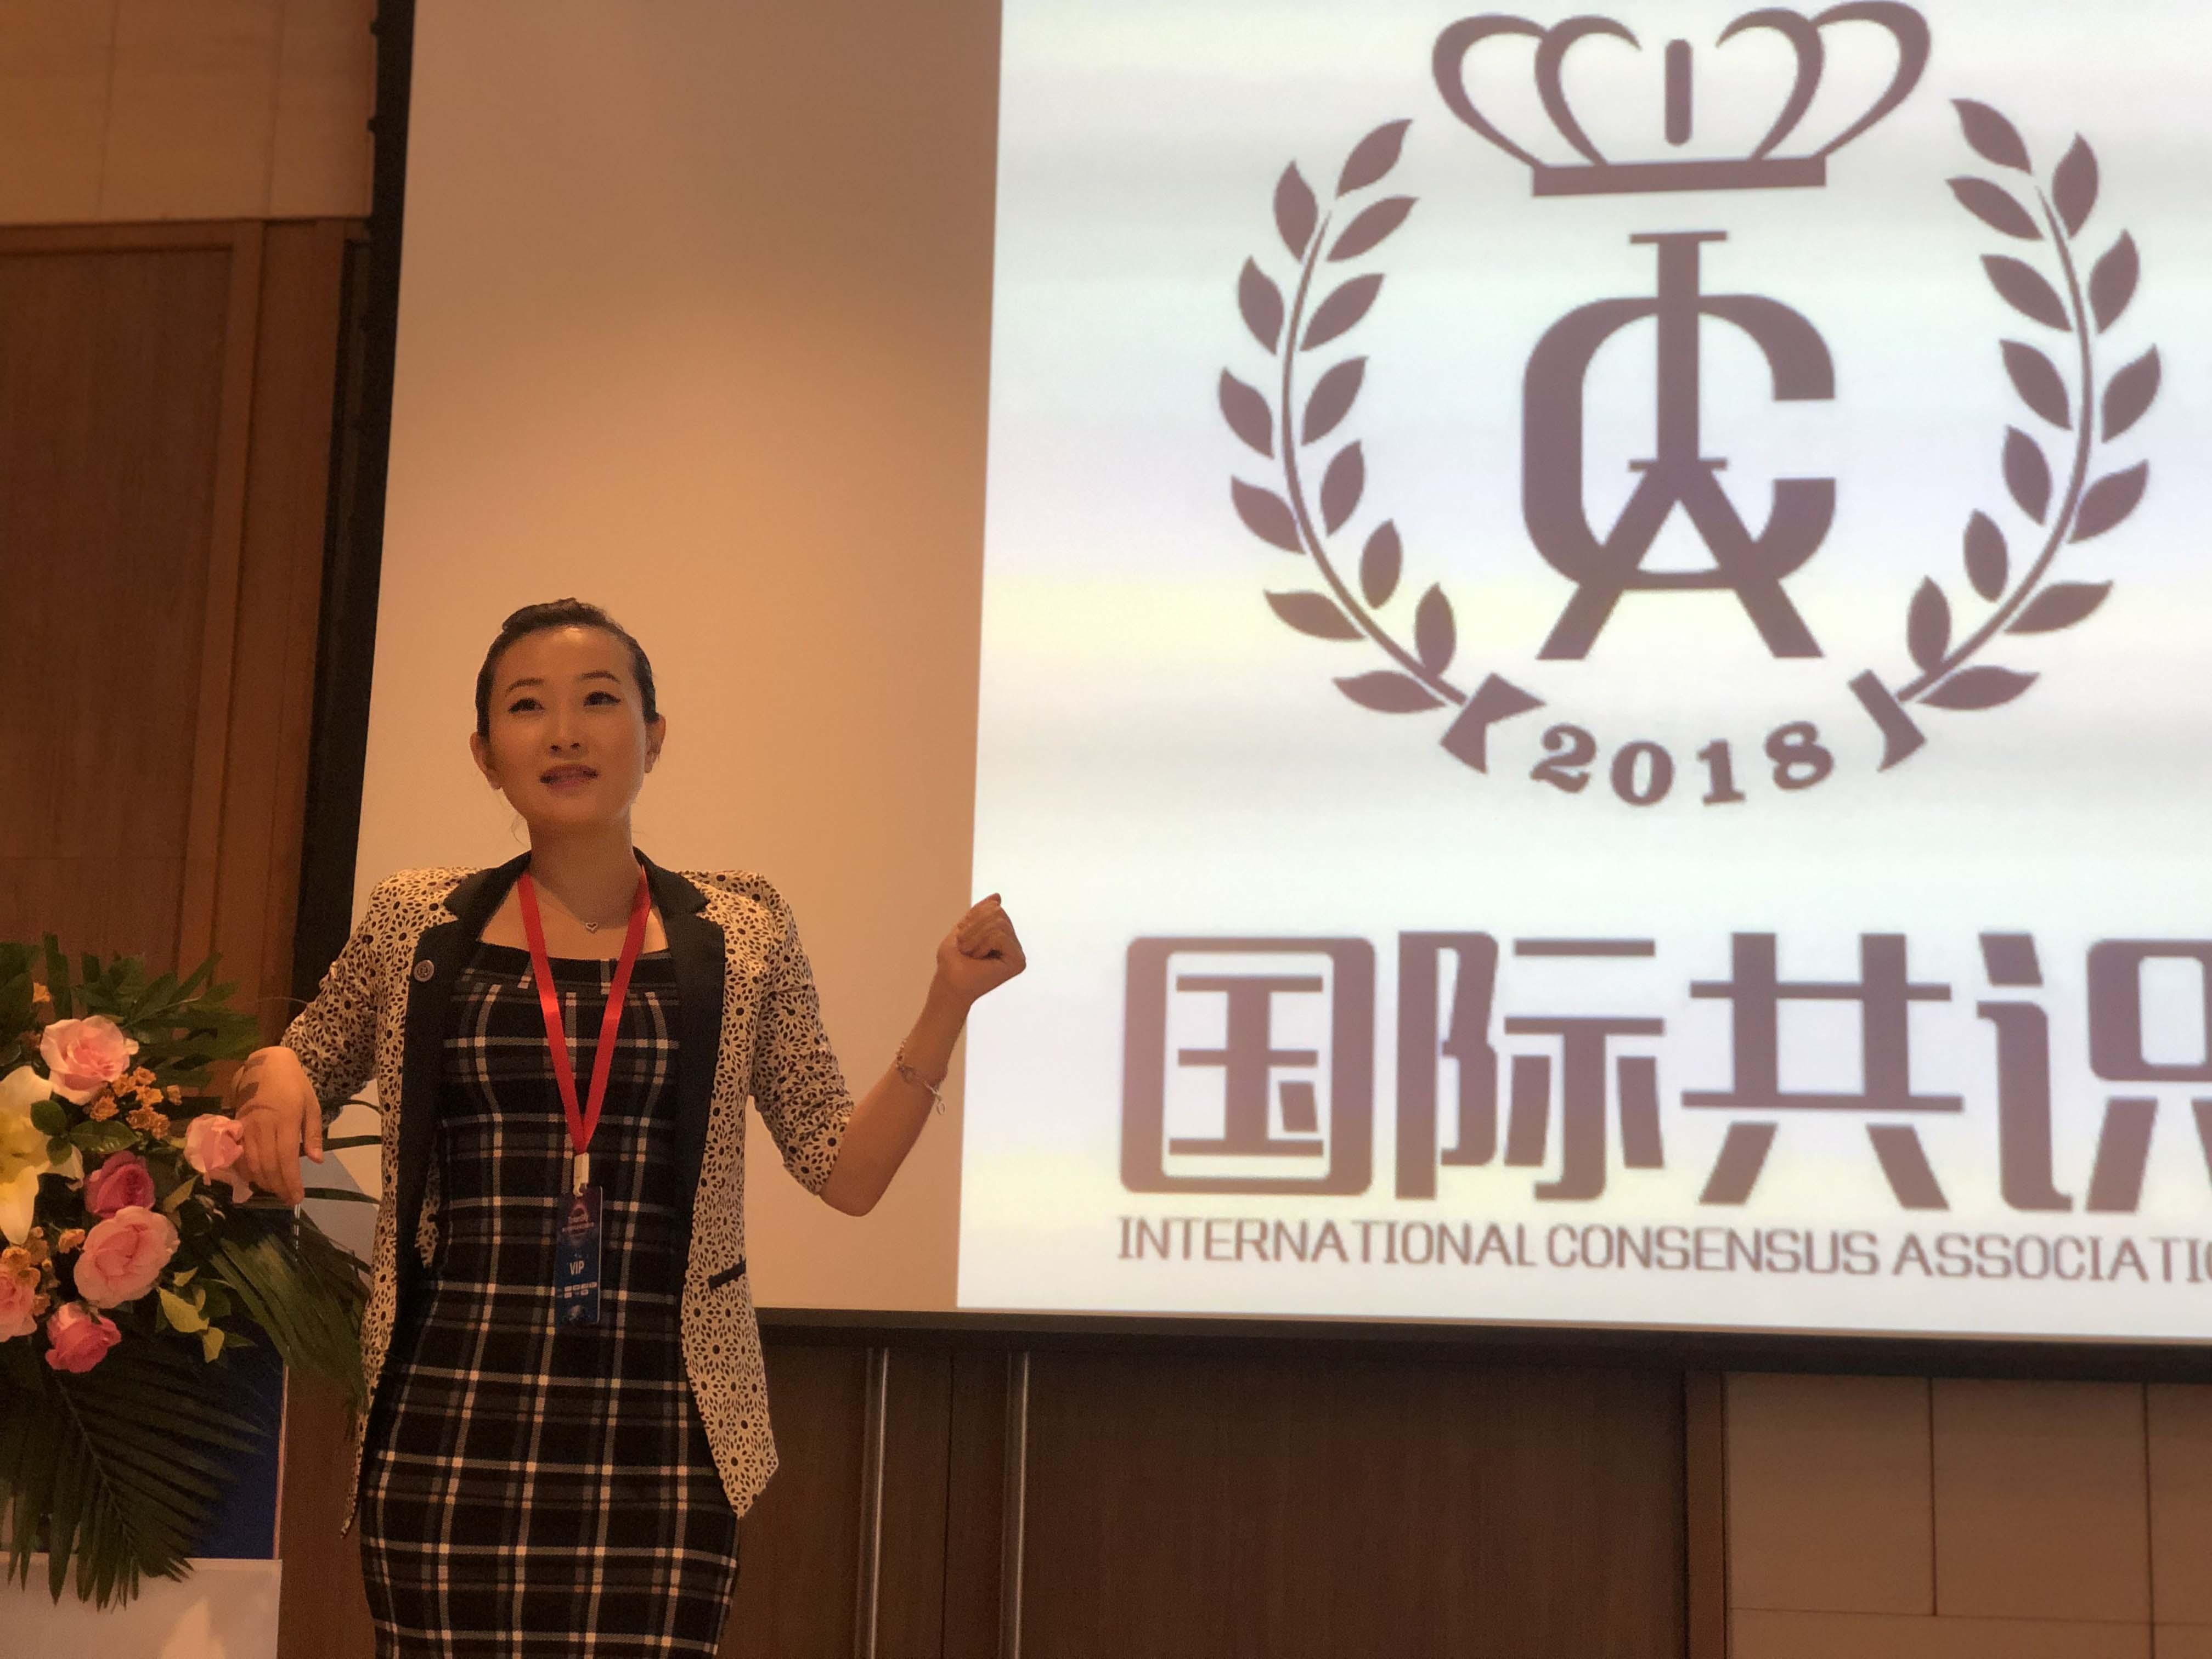 TokenSky联合国际共识举办海外区块链项目落地与应用(亚洲区)研讨会成功举办